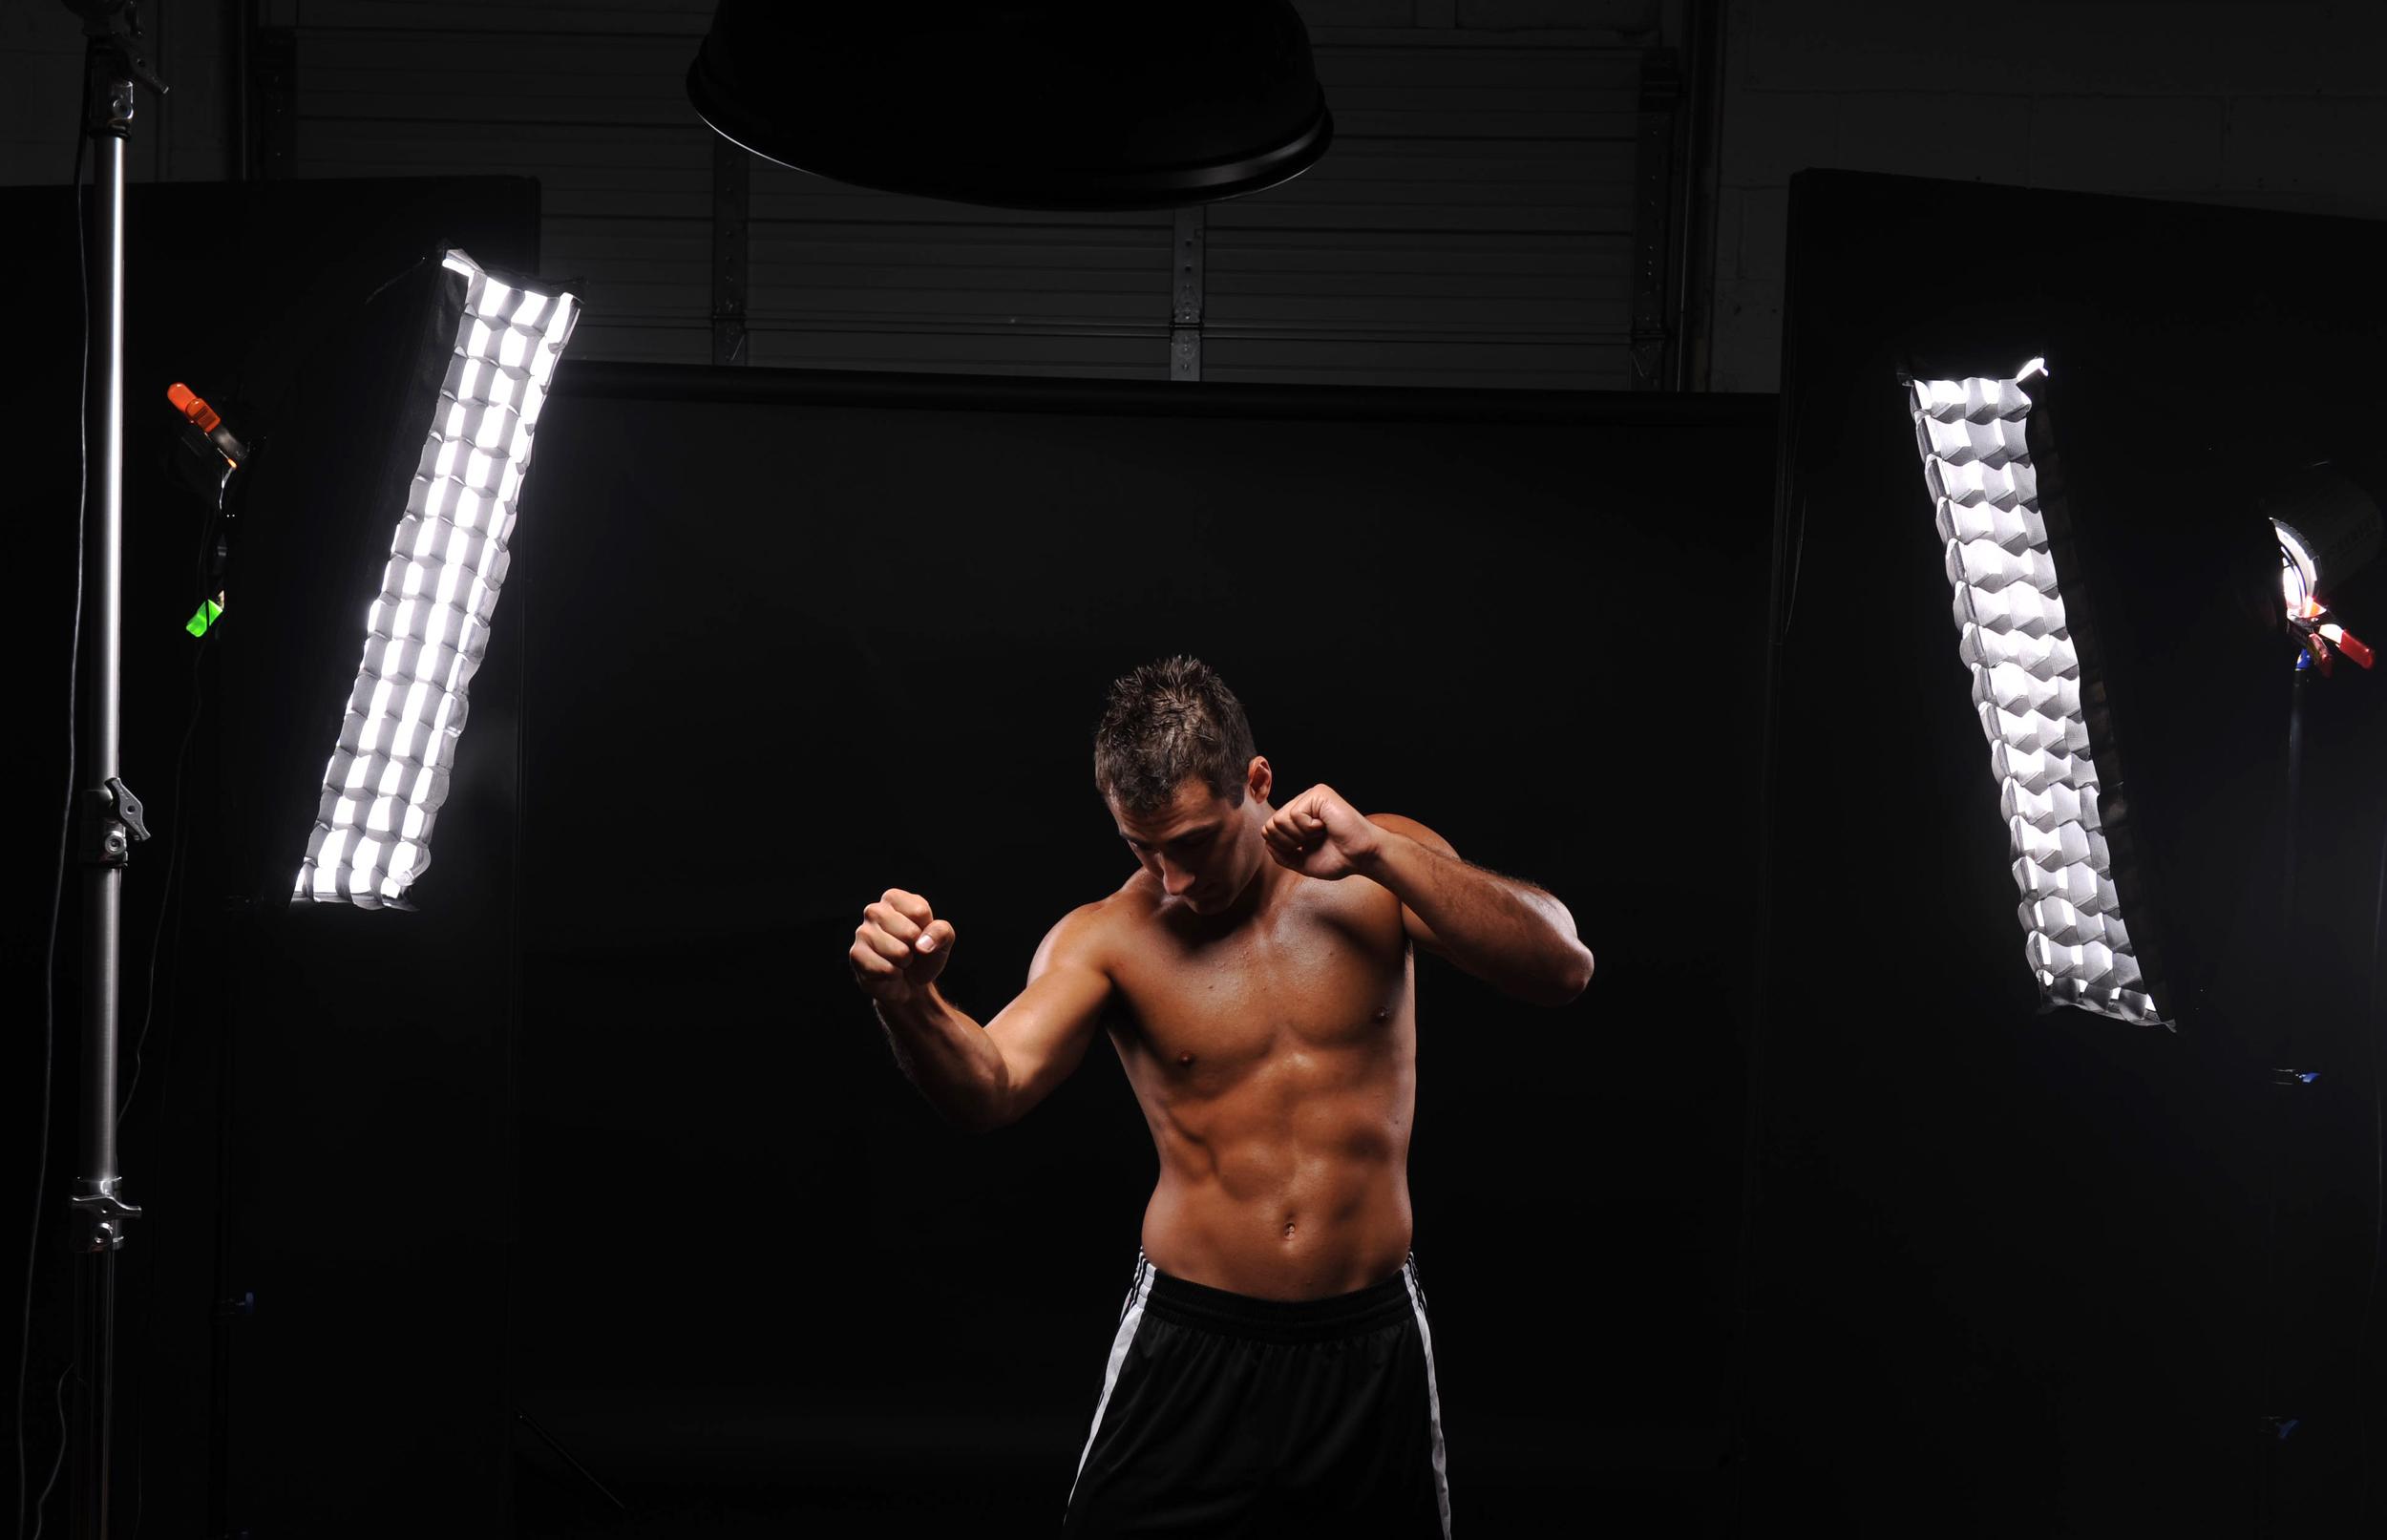 dc photographer, fitness, vida fitness, Washington DC fitness photographer